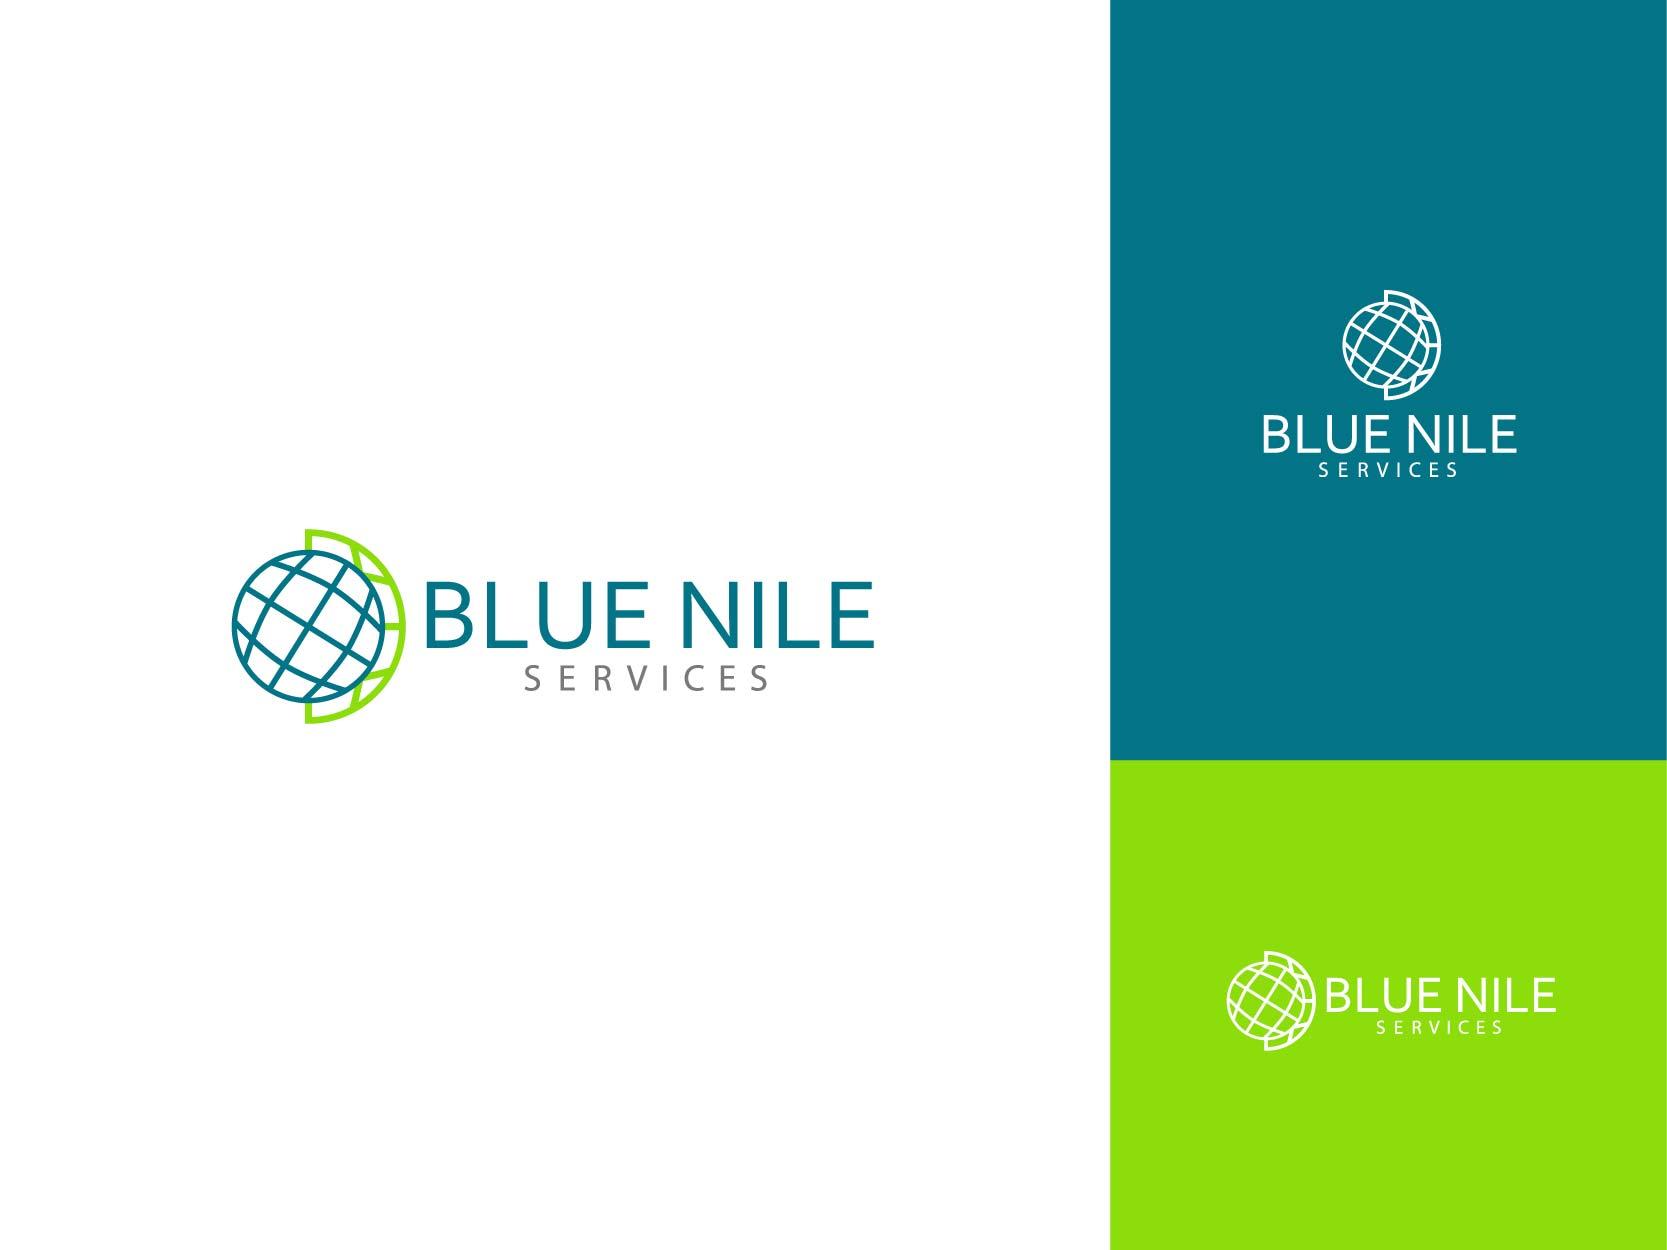 Logo Design by Osi Indra - Entry No. 24 in the Logo Design Contest Imaginative Logo Design for Blue Nile Service Ltd.